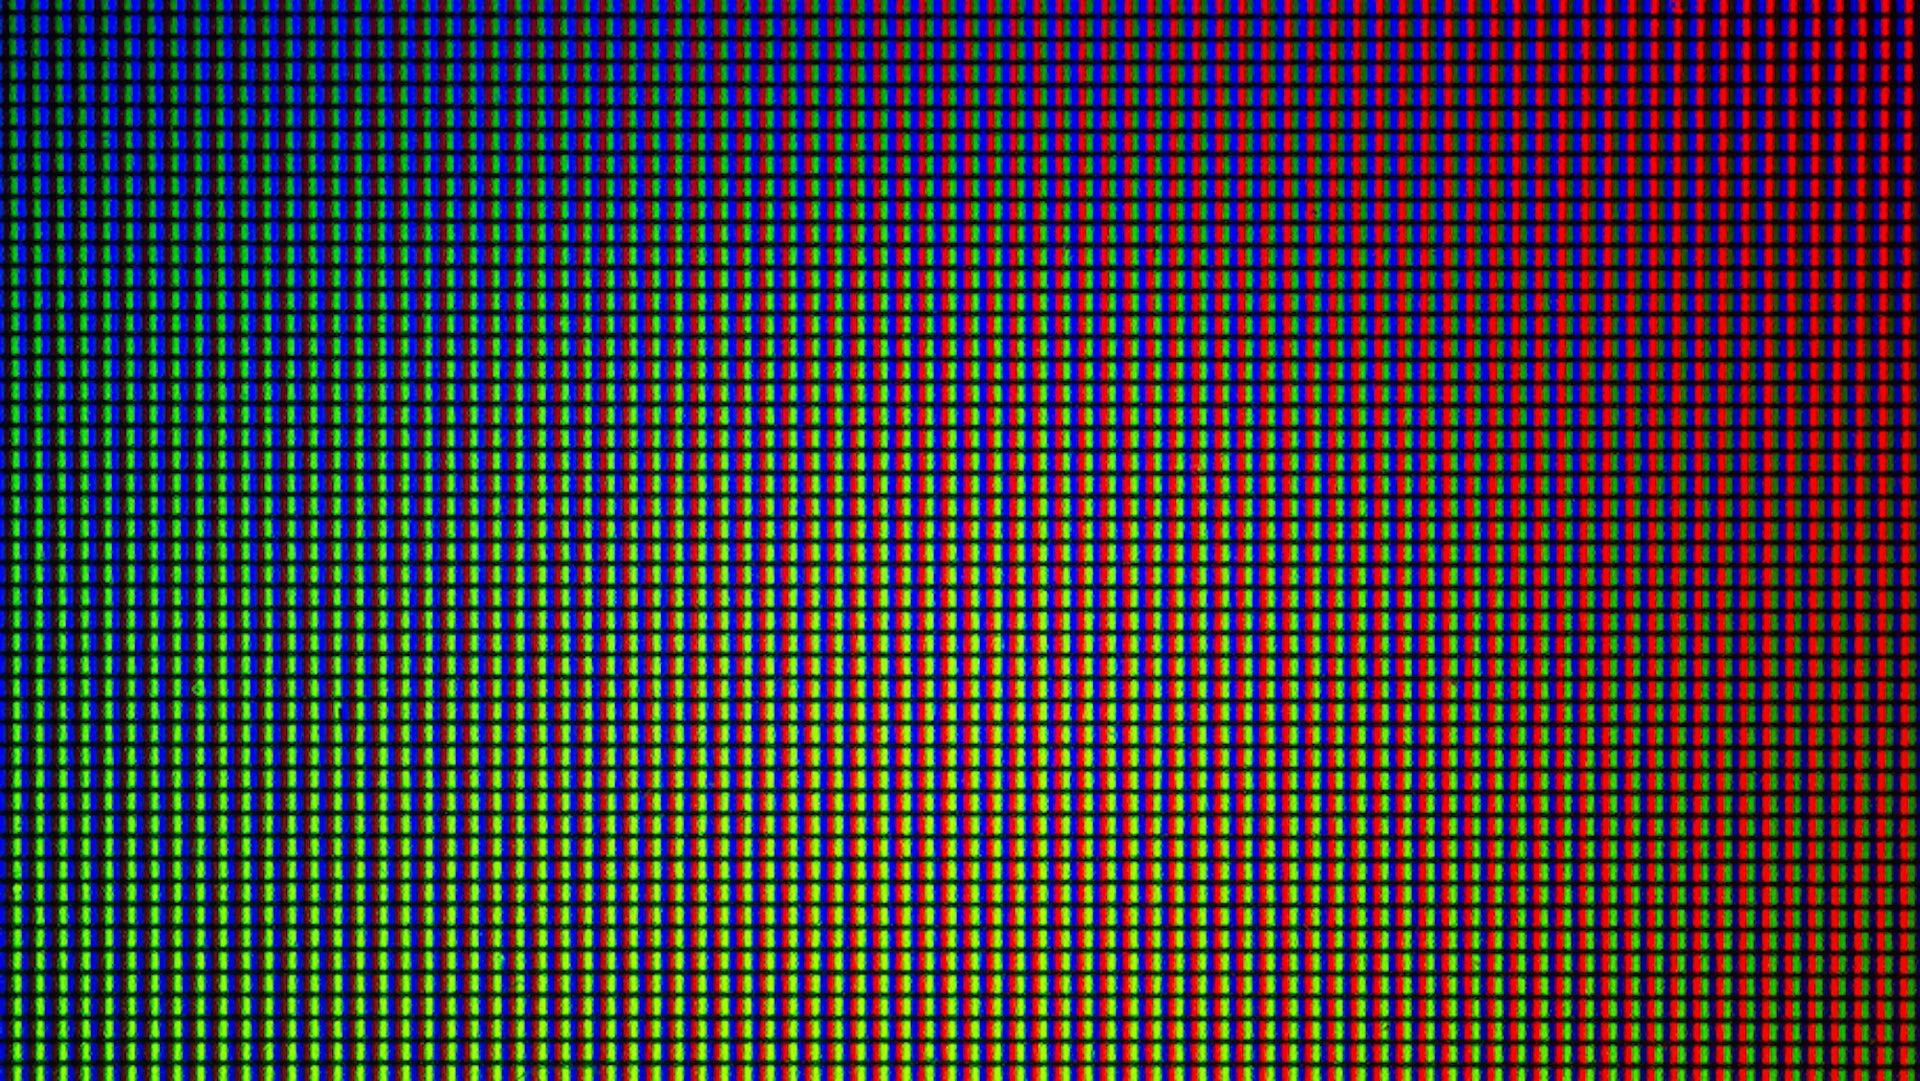 Image 20170405 14626 1dvy7ng.jpg?ixlib=rb 1.1